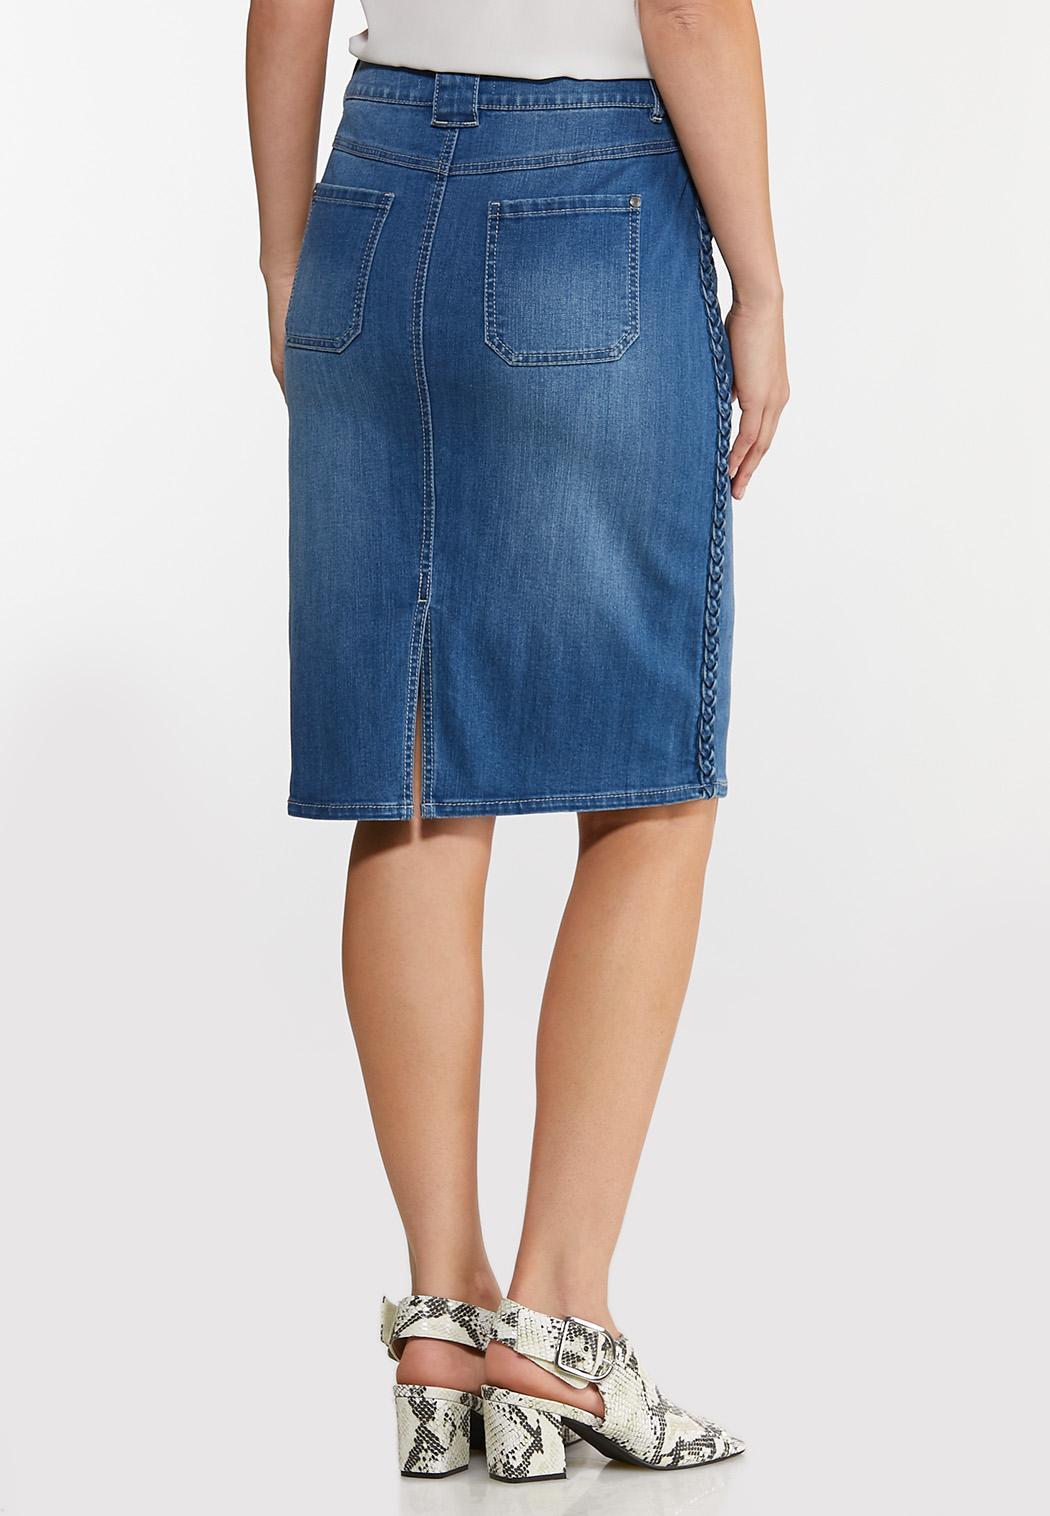 Plus Size Braided Trim Denim Skirt (Item #44142380)